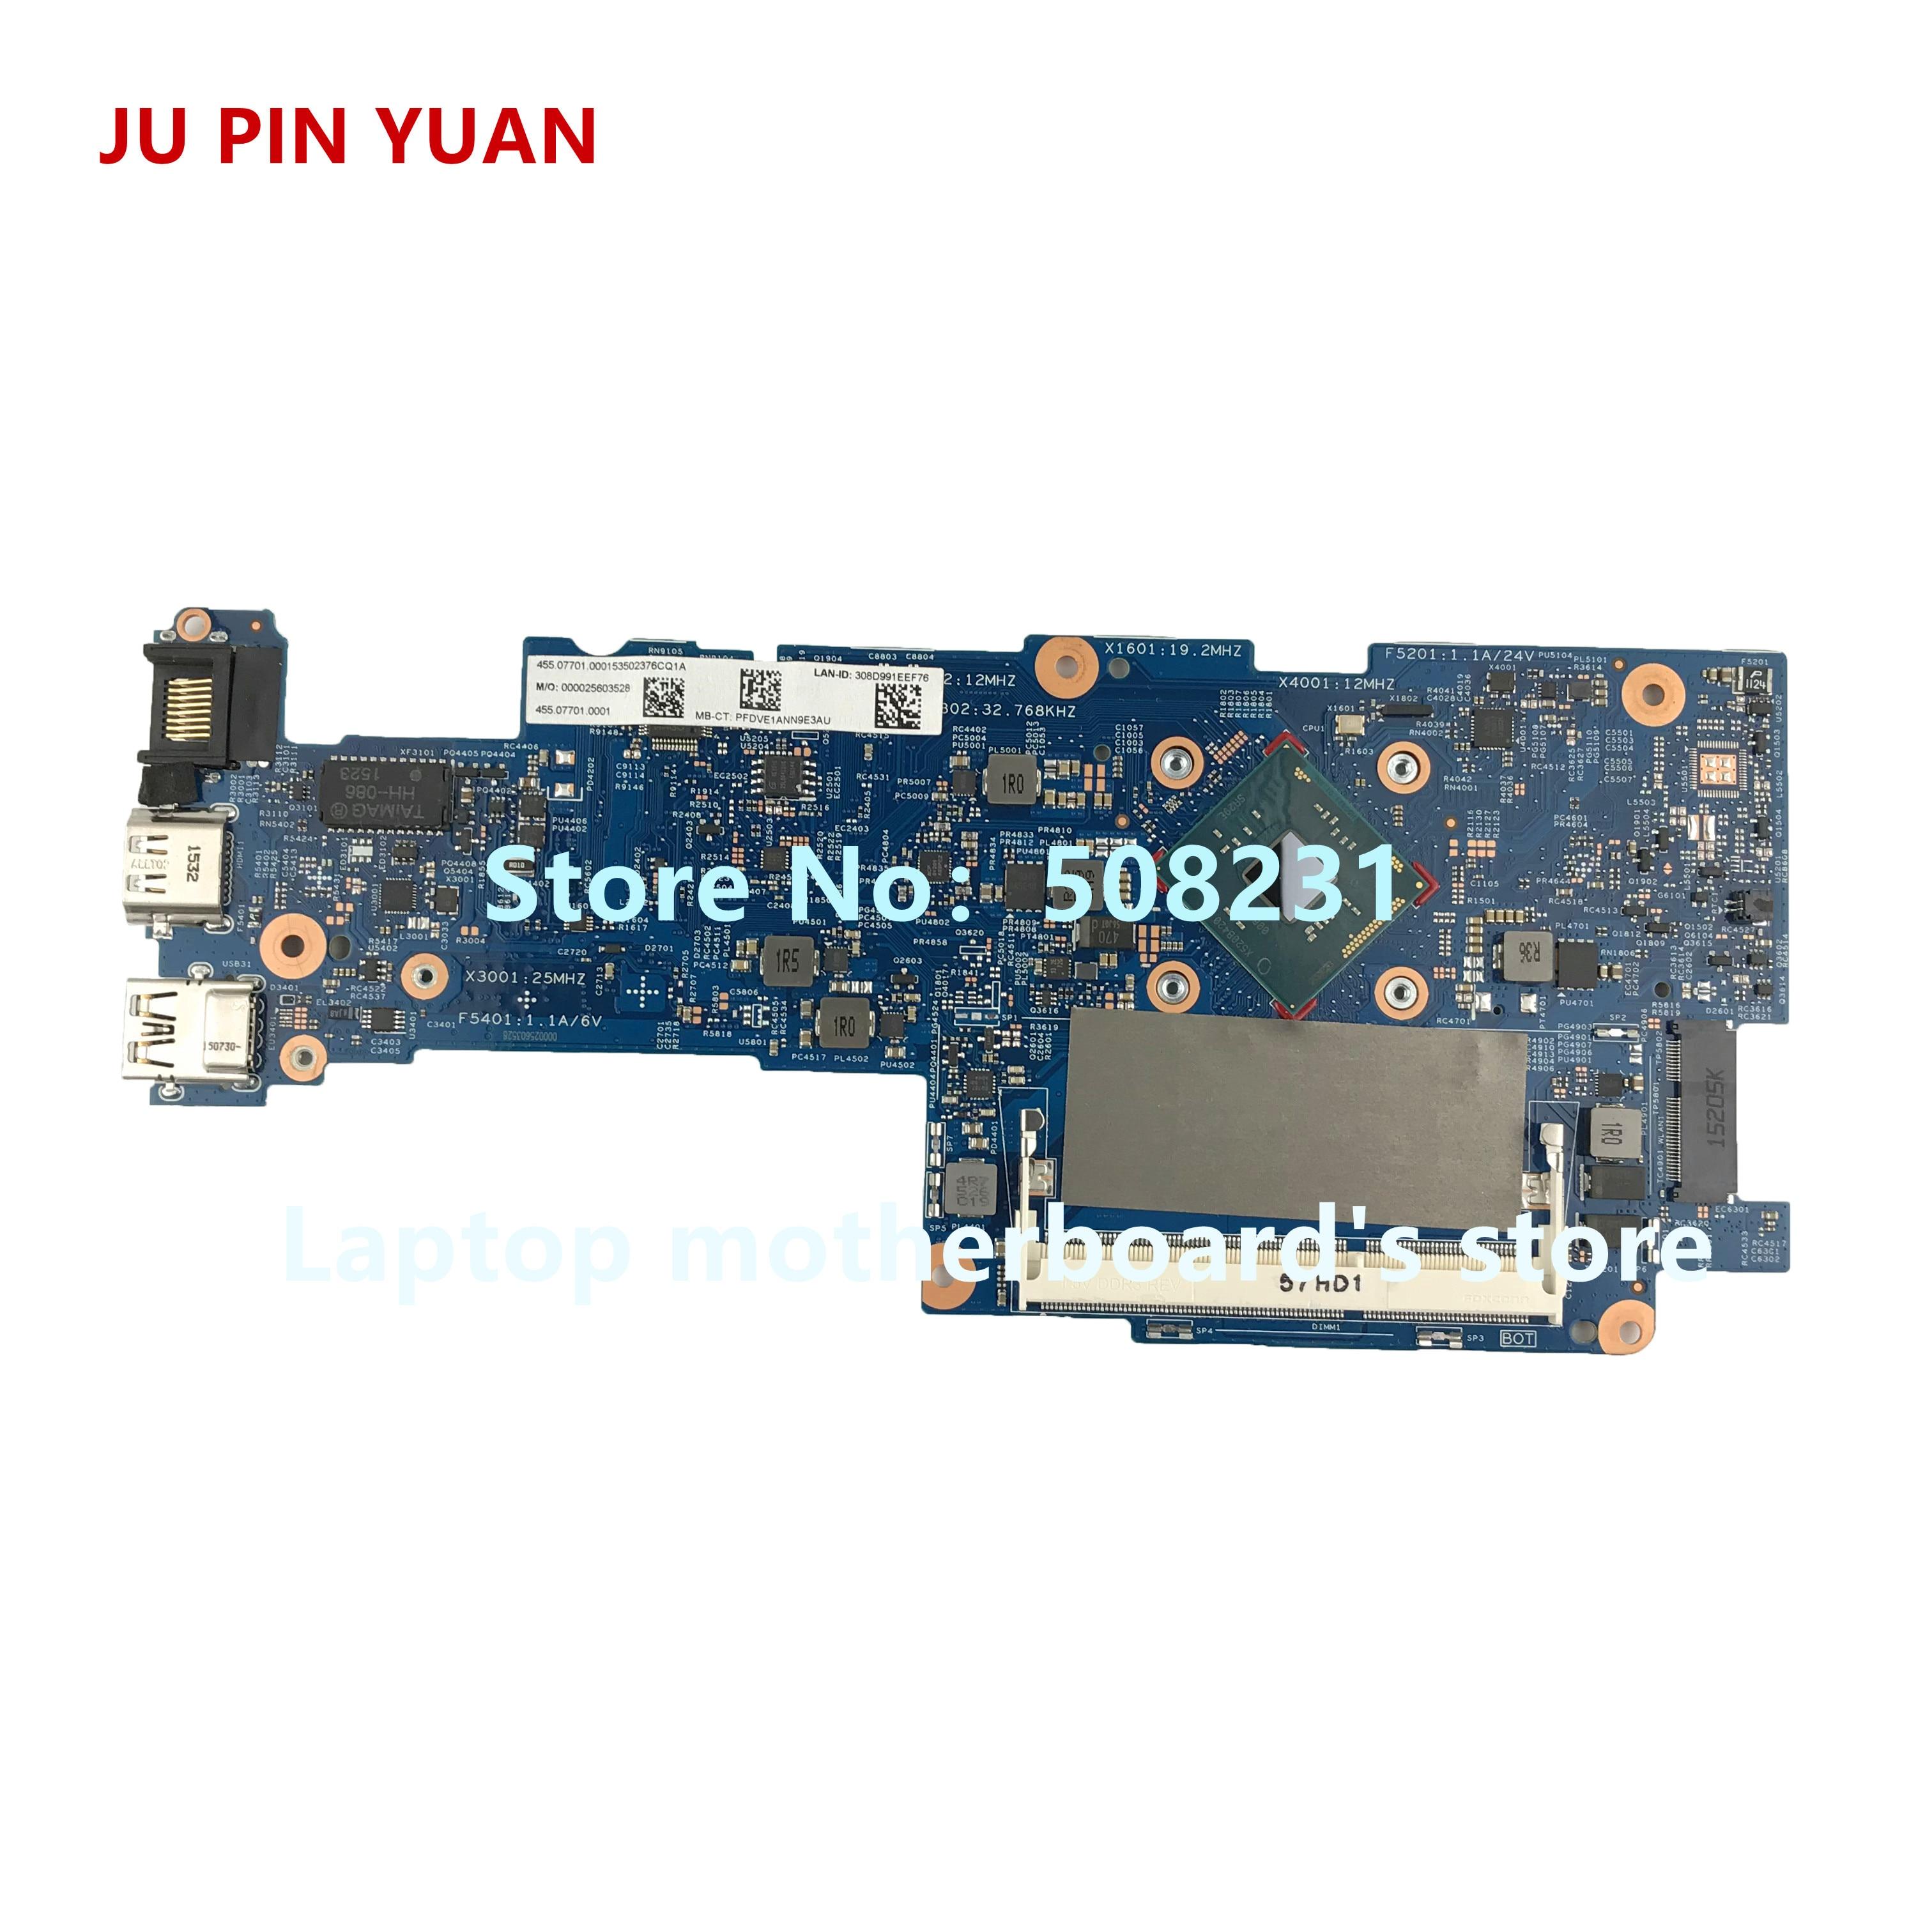 JU PIN YUAN 828895-601 mainboard for HP Pavilion 11-K x360 Convertible 11-k 11-K128CA motherboard with PentN3700 fully TestedJU PIN YUAN 828895-601 mainboard for HP Pavilion 11-K x360 Convertible 11-k 11-K128CA motherboard with PentN3700 fully Tested